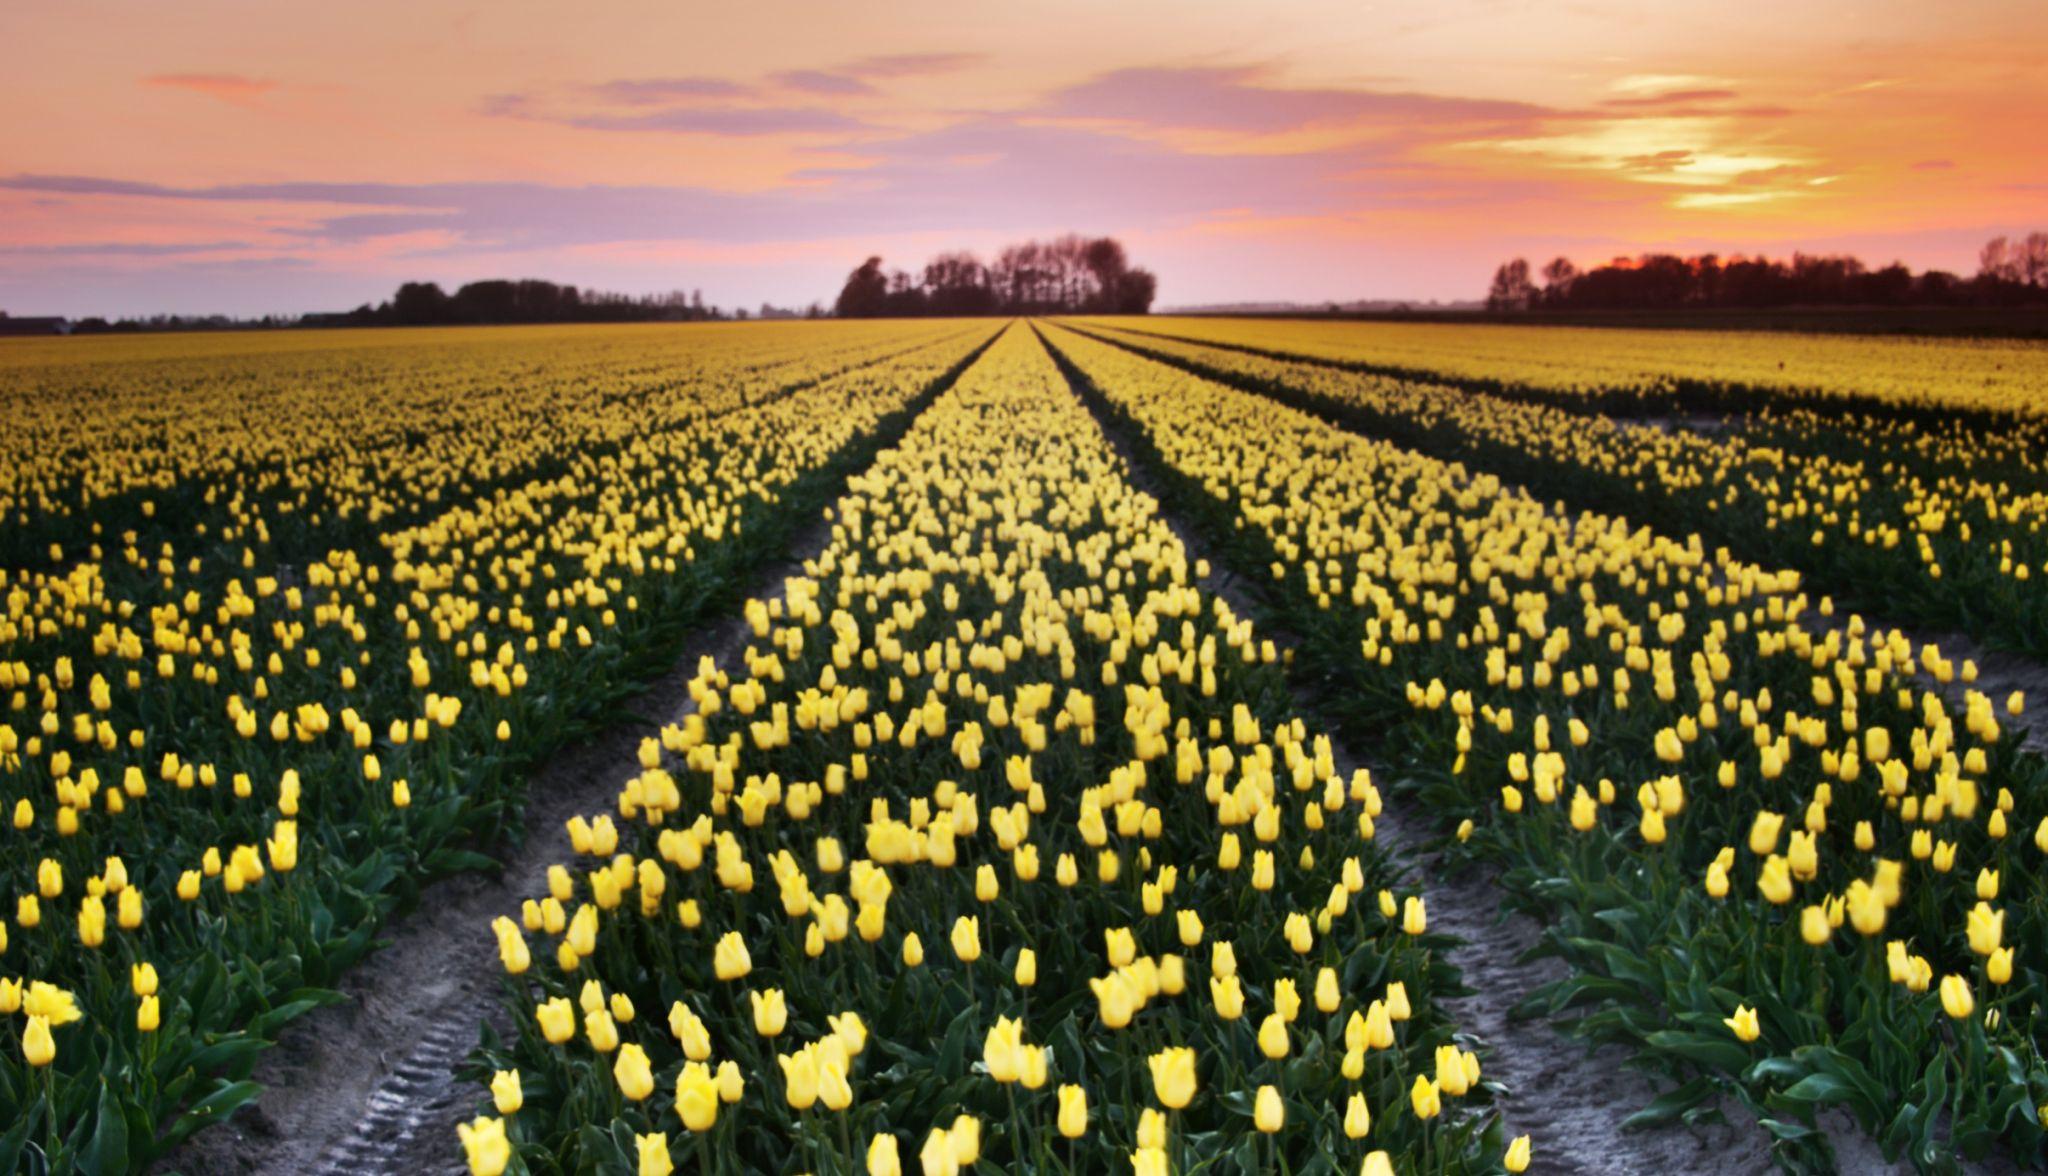 Tulip fields at sunset, Netherlands